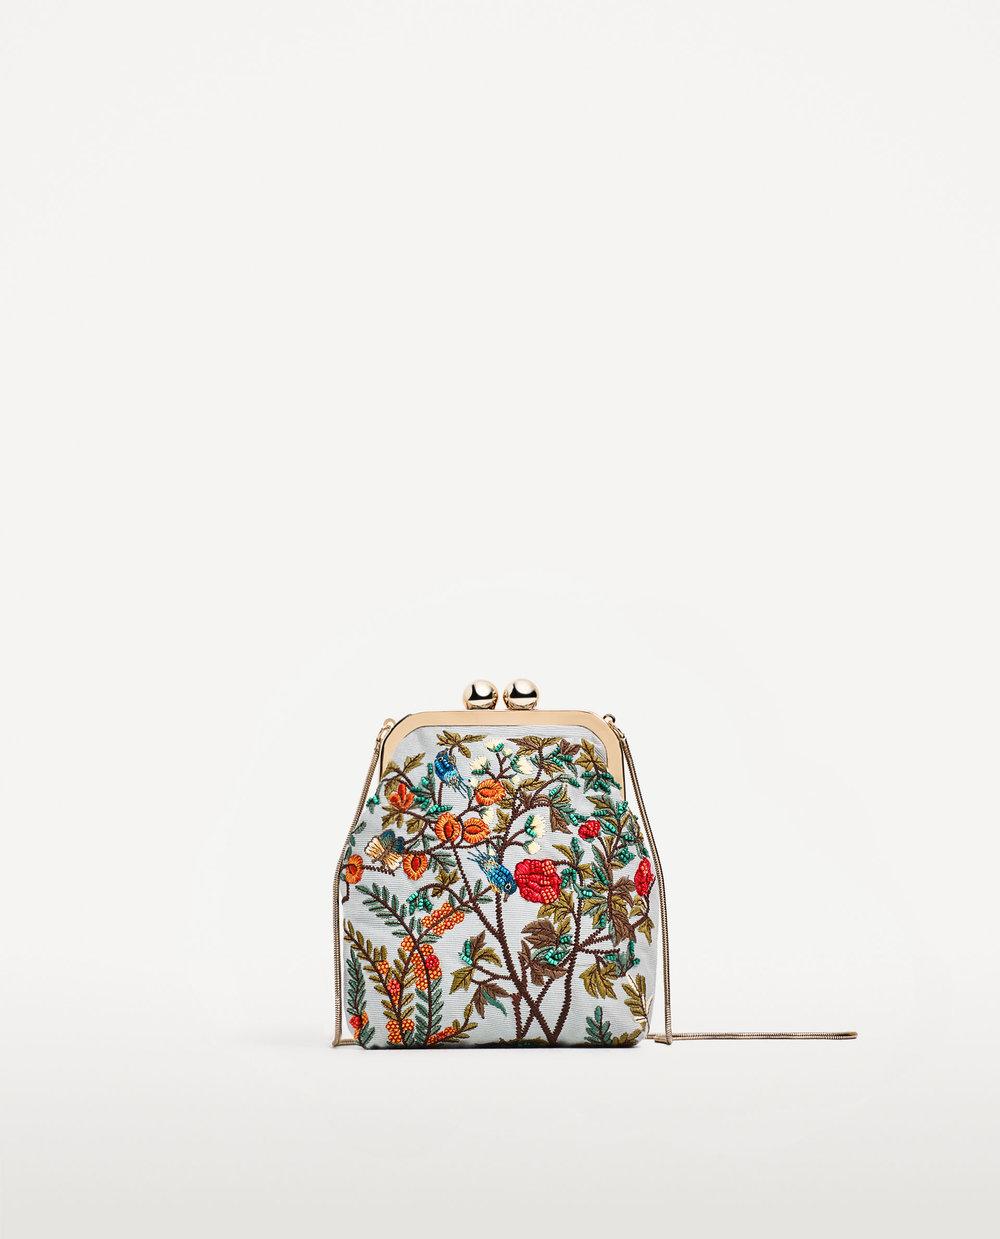 Mini Embroidered Crossbody by Zara - $30